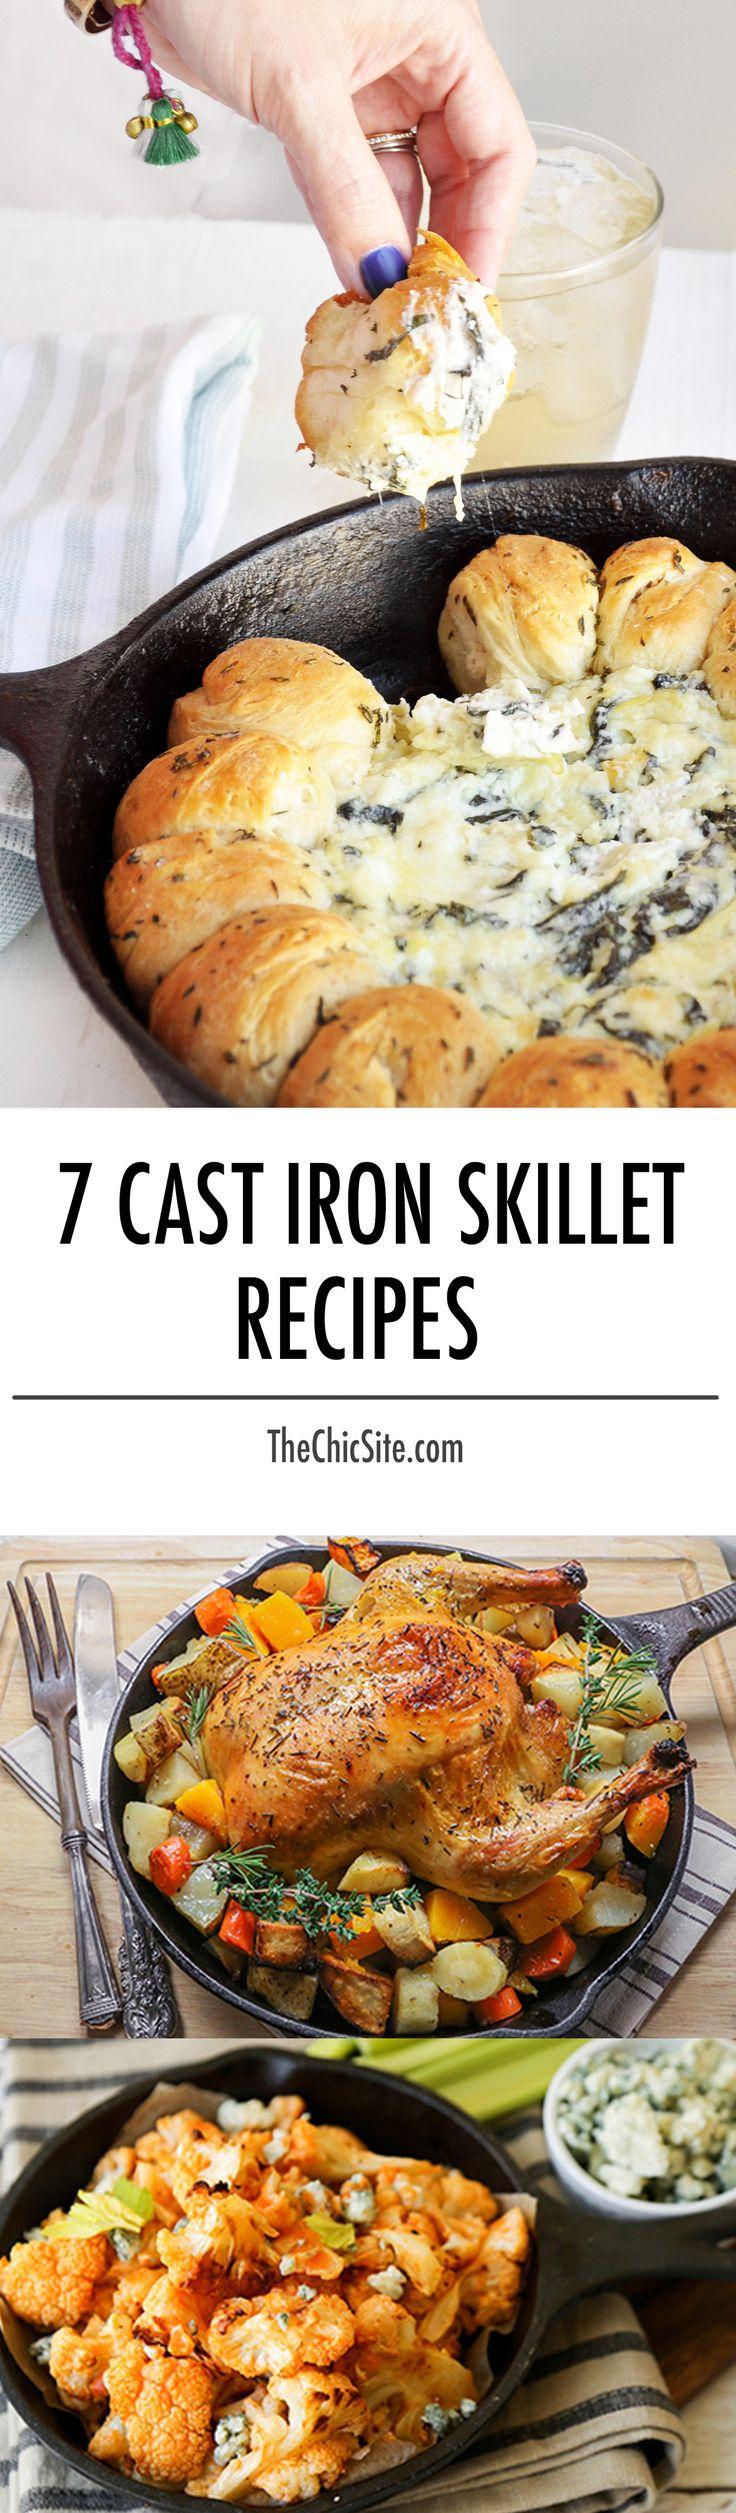 cast iron skillet recipes                                                                                                                                                                                 More